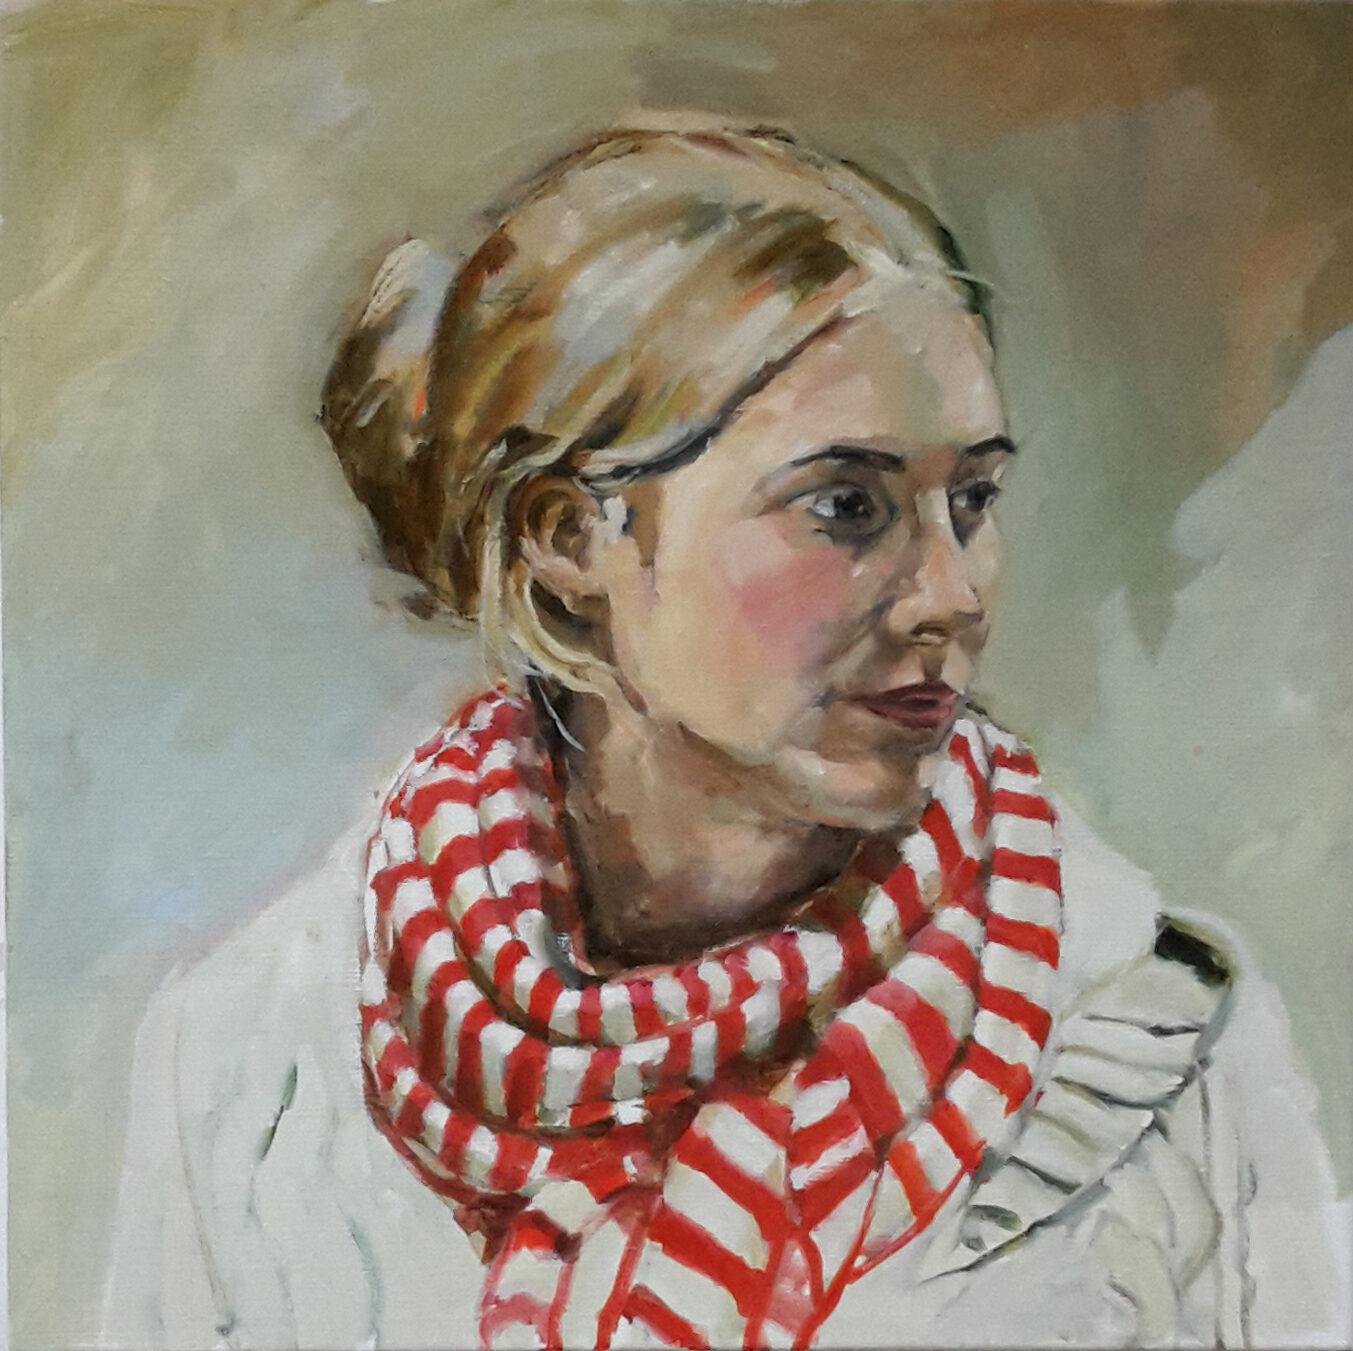 portretJana, olioever op linnen, 50 x 50 cm, 2017